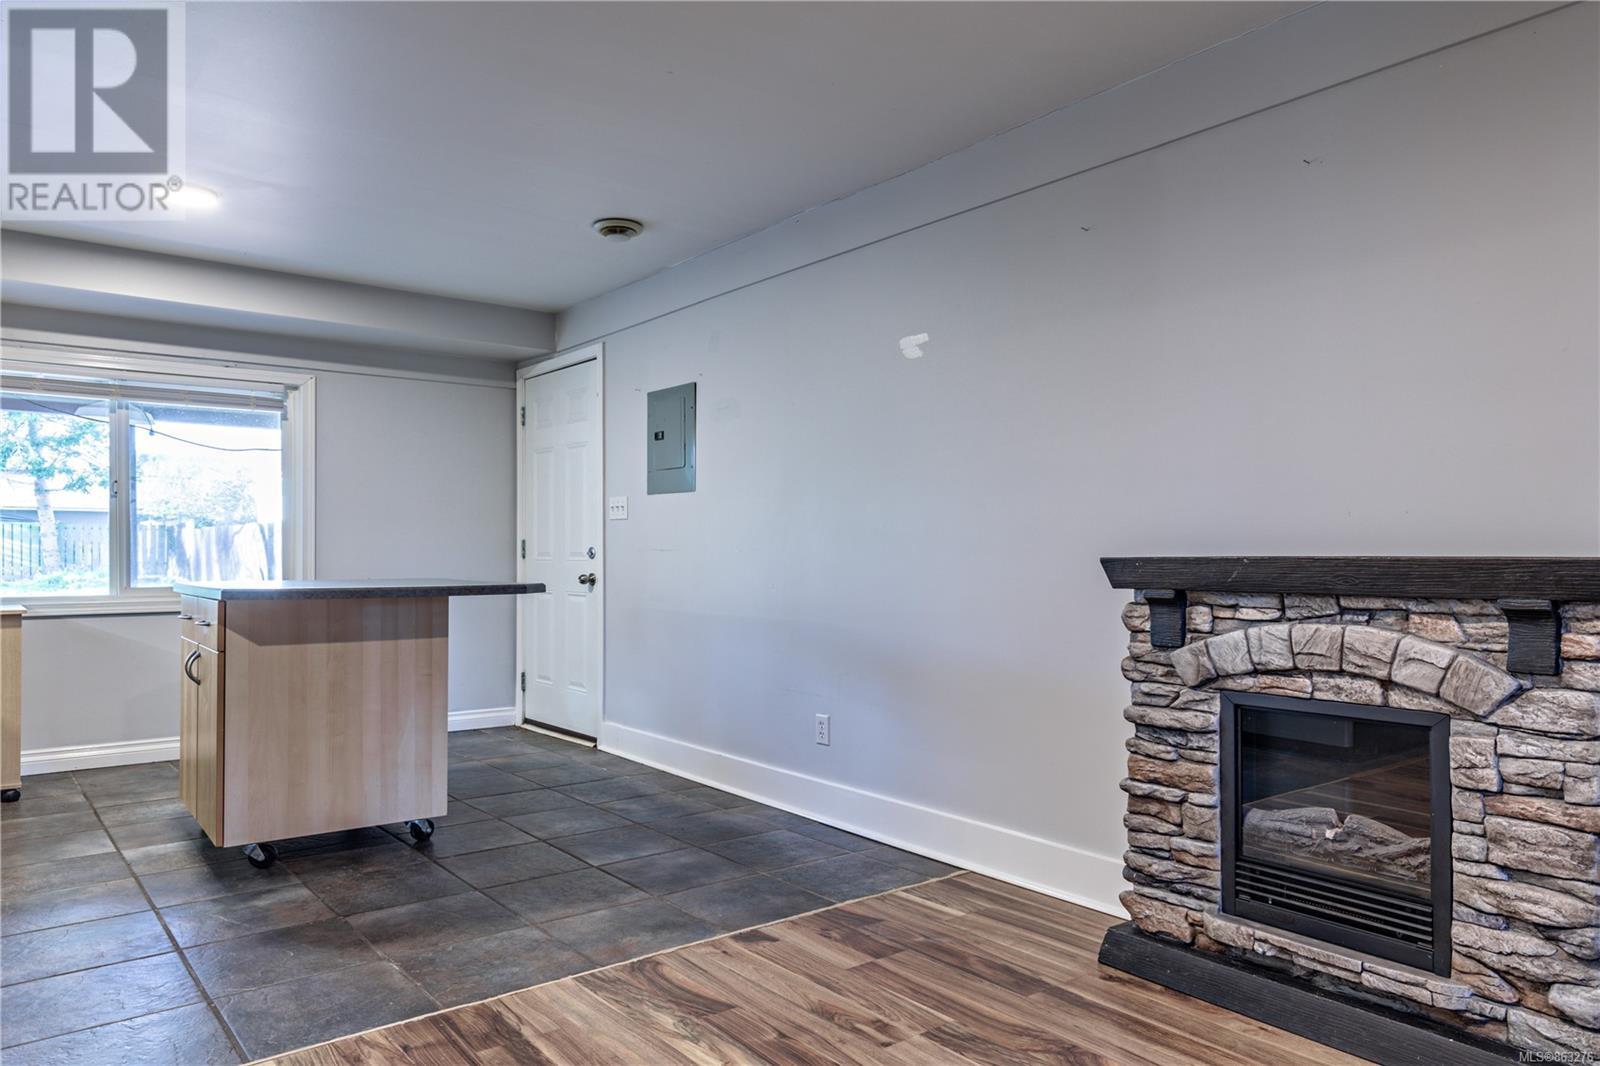 673 Winchester Ave, Nanaimo, British Columbia  V9R 4B6 - Photo 3 - 863276